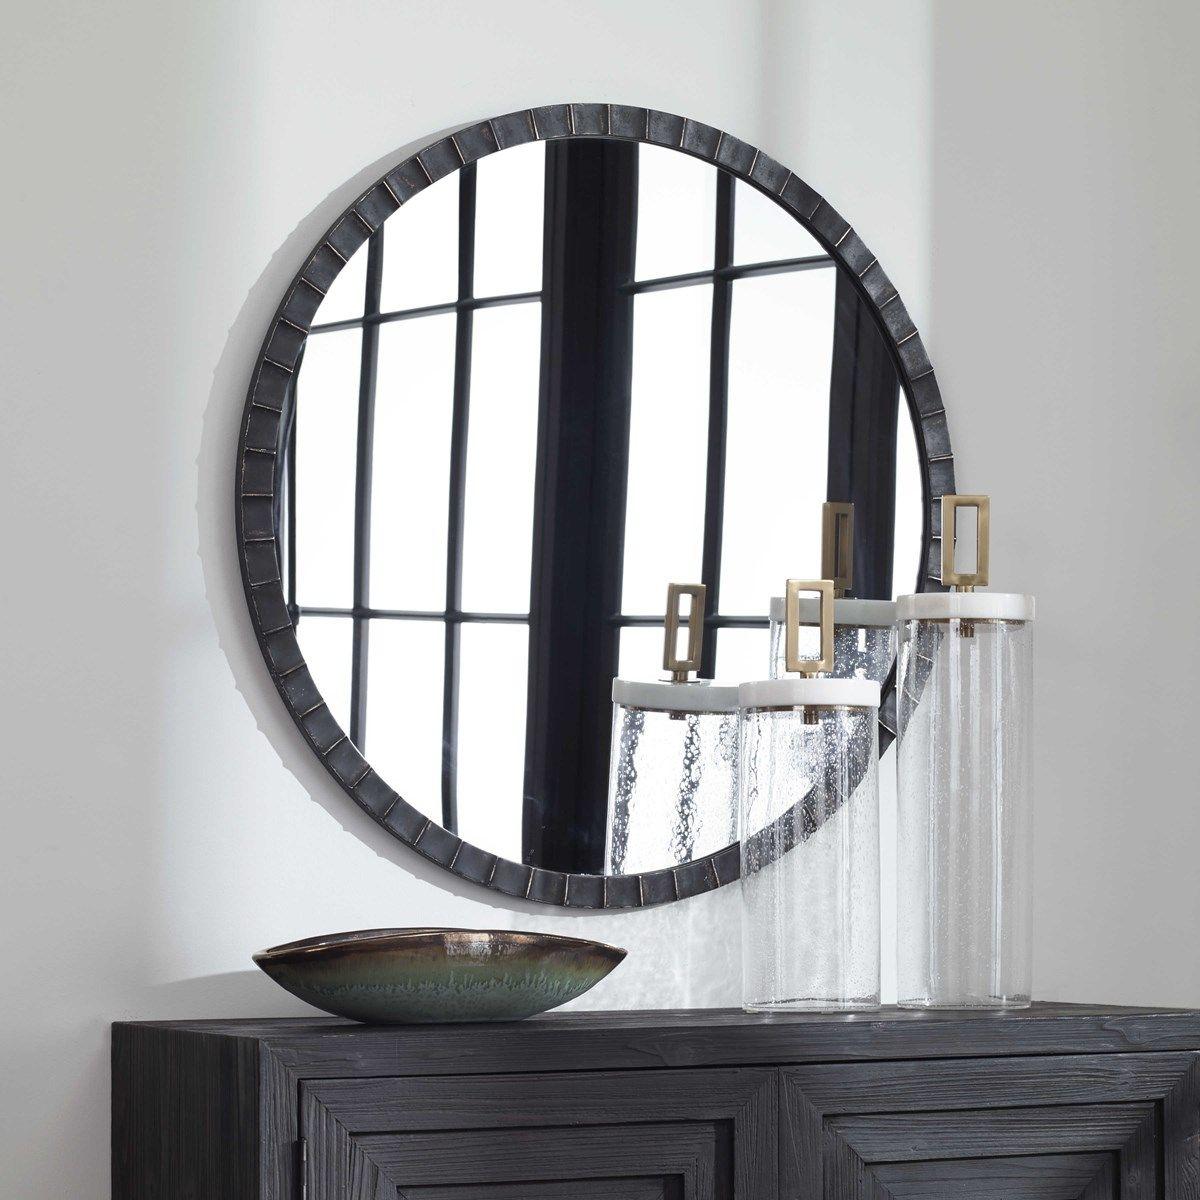 49 Mirrors Ideas In 2021 Mirror Wall Mirror Uttermost Mirrors